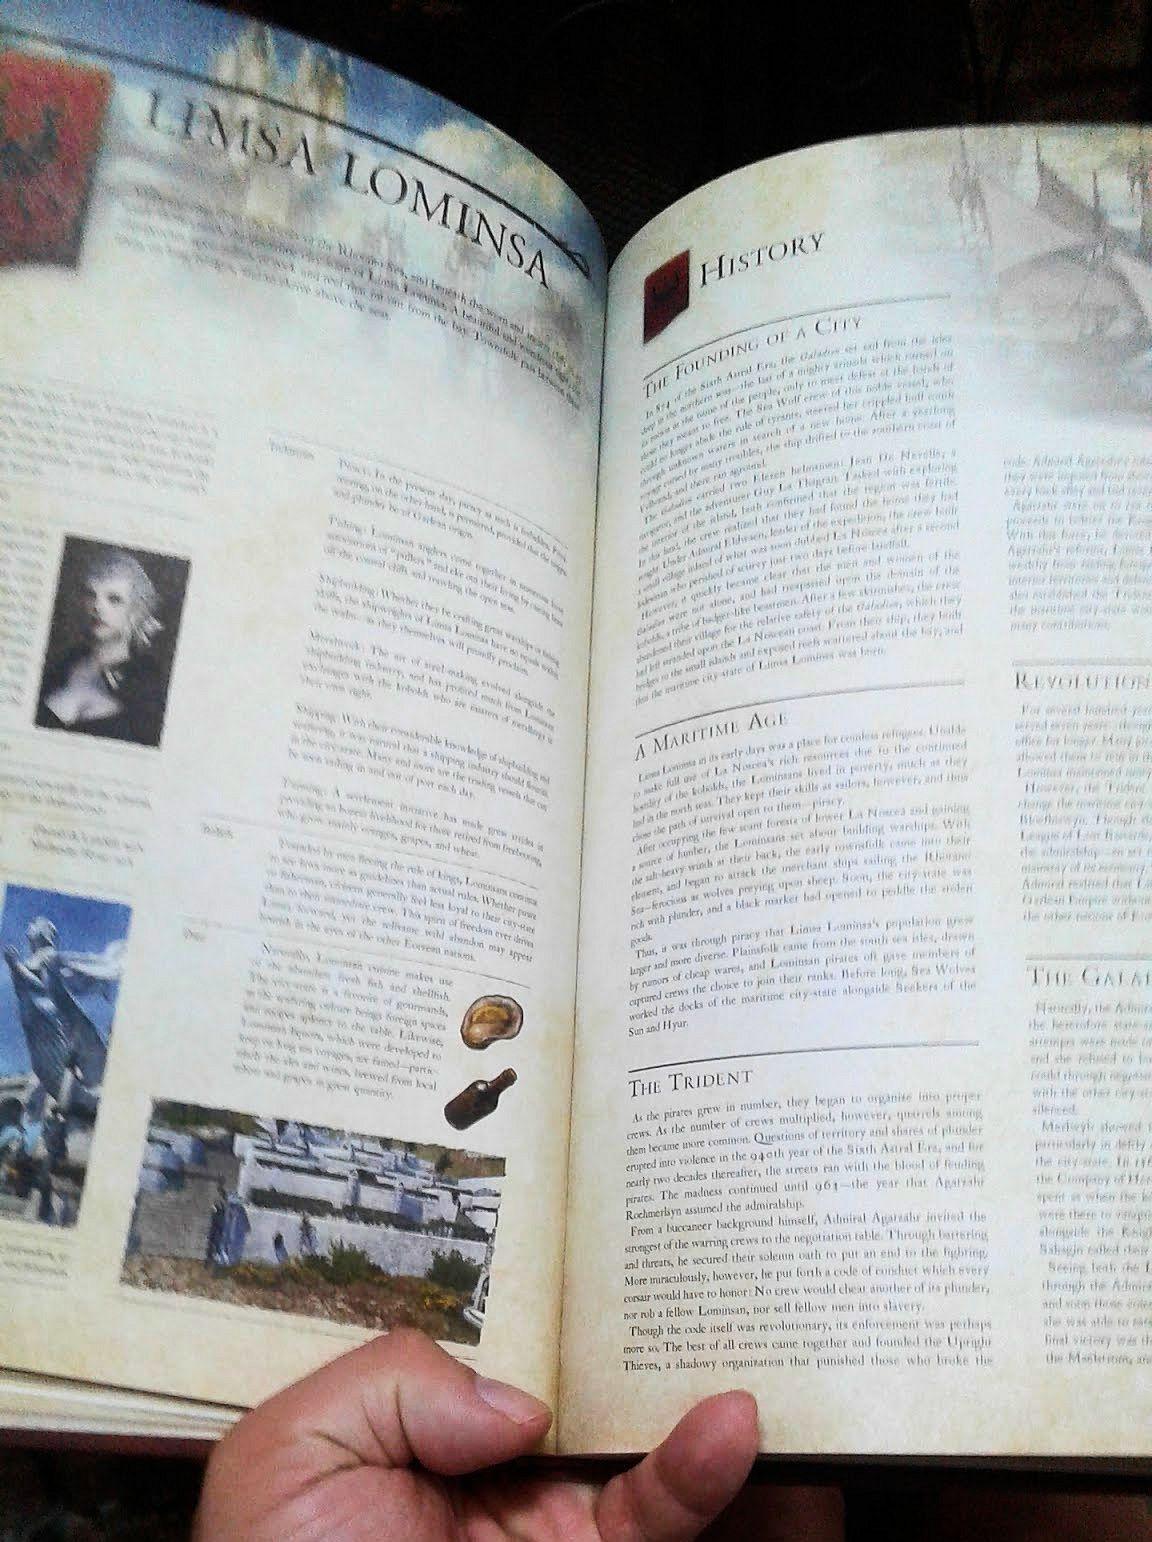 Final Fantasy XIV Fan Festival: The lore book in review